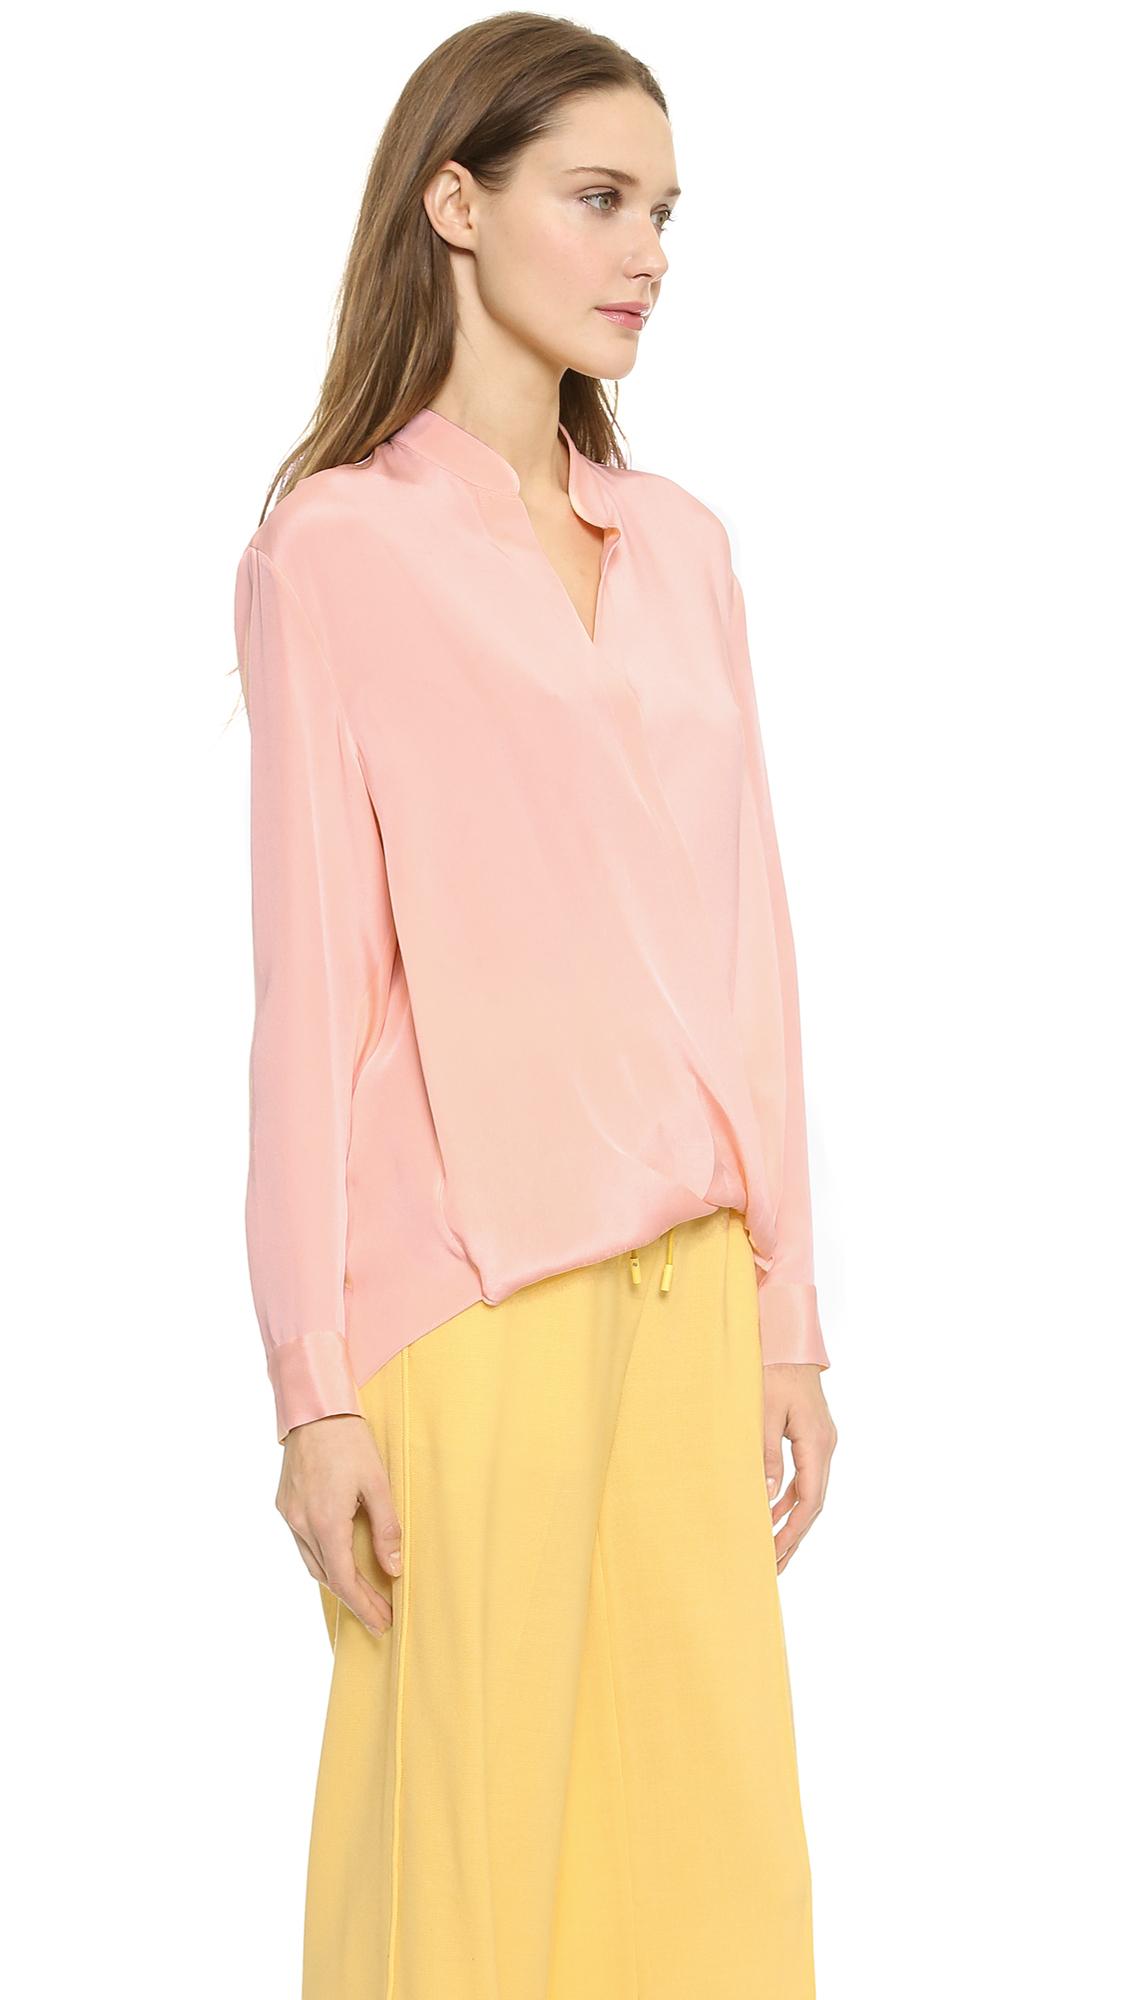 5c4b94d246561 Lyst - 3.1 Phillip Lim Silk Tuck Drape Blouse - Peach Puff in Pink